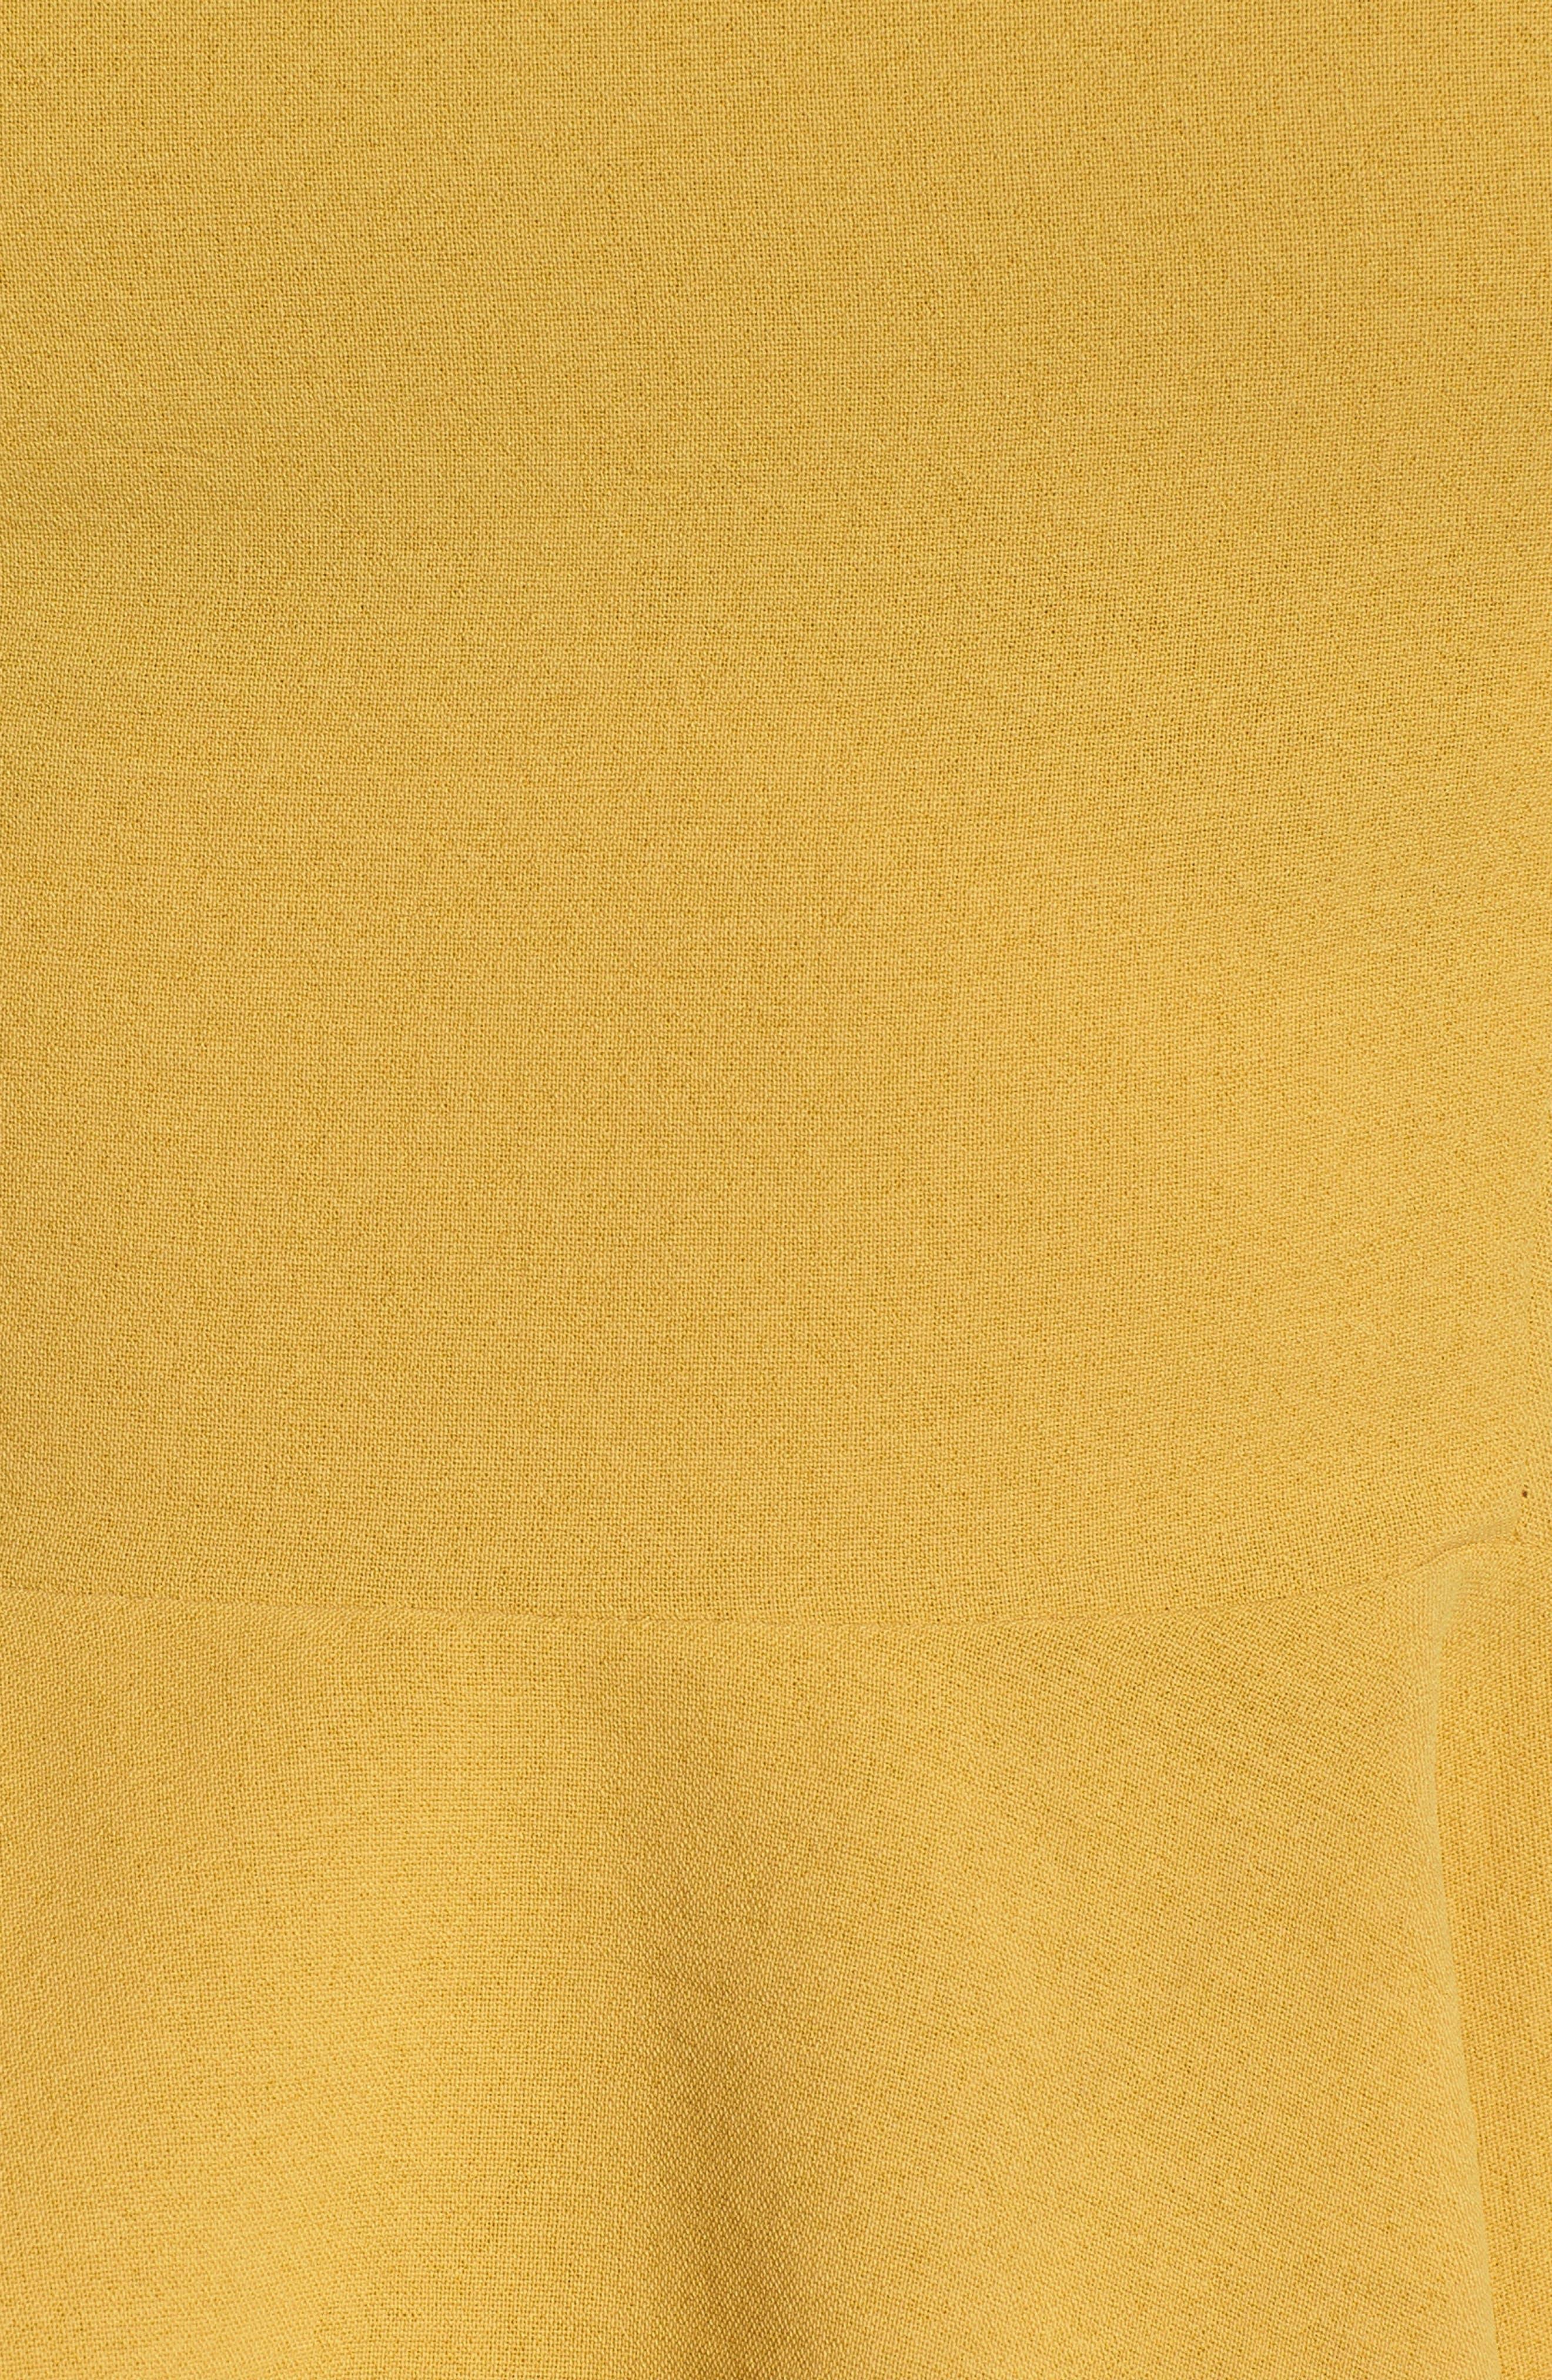 Chriselle x J.O.A. Asymmetrical Peplum Top,                             Alternate thumbnail 5, color,                             700